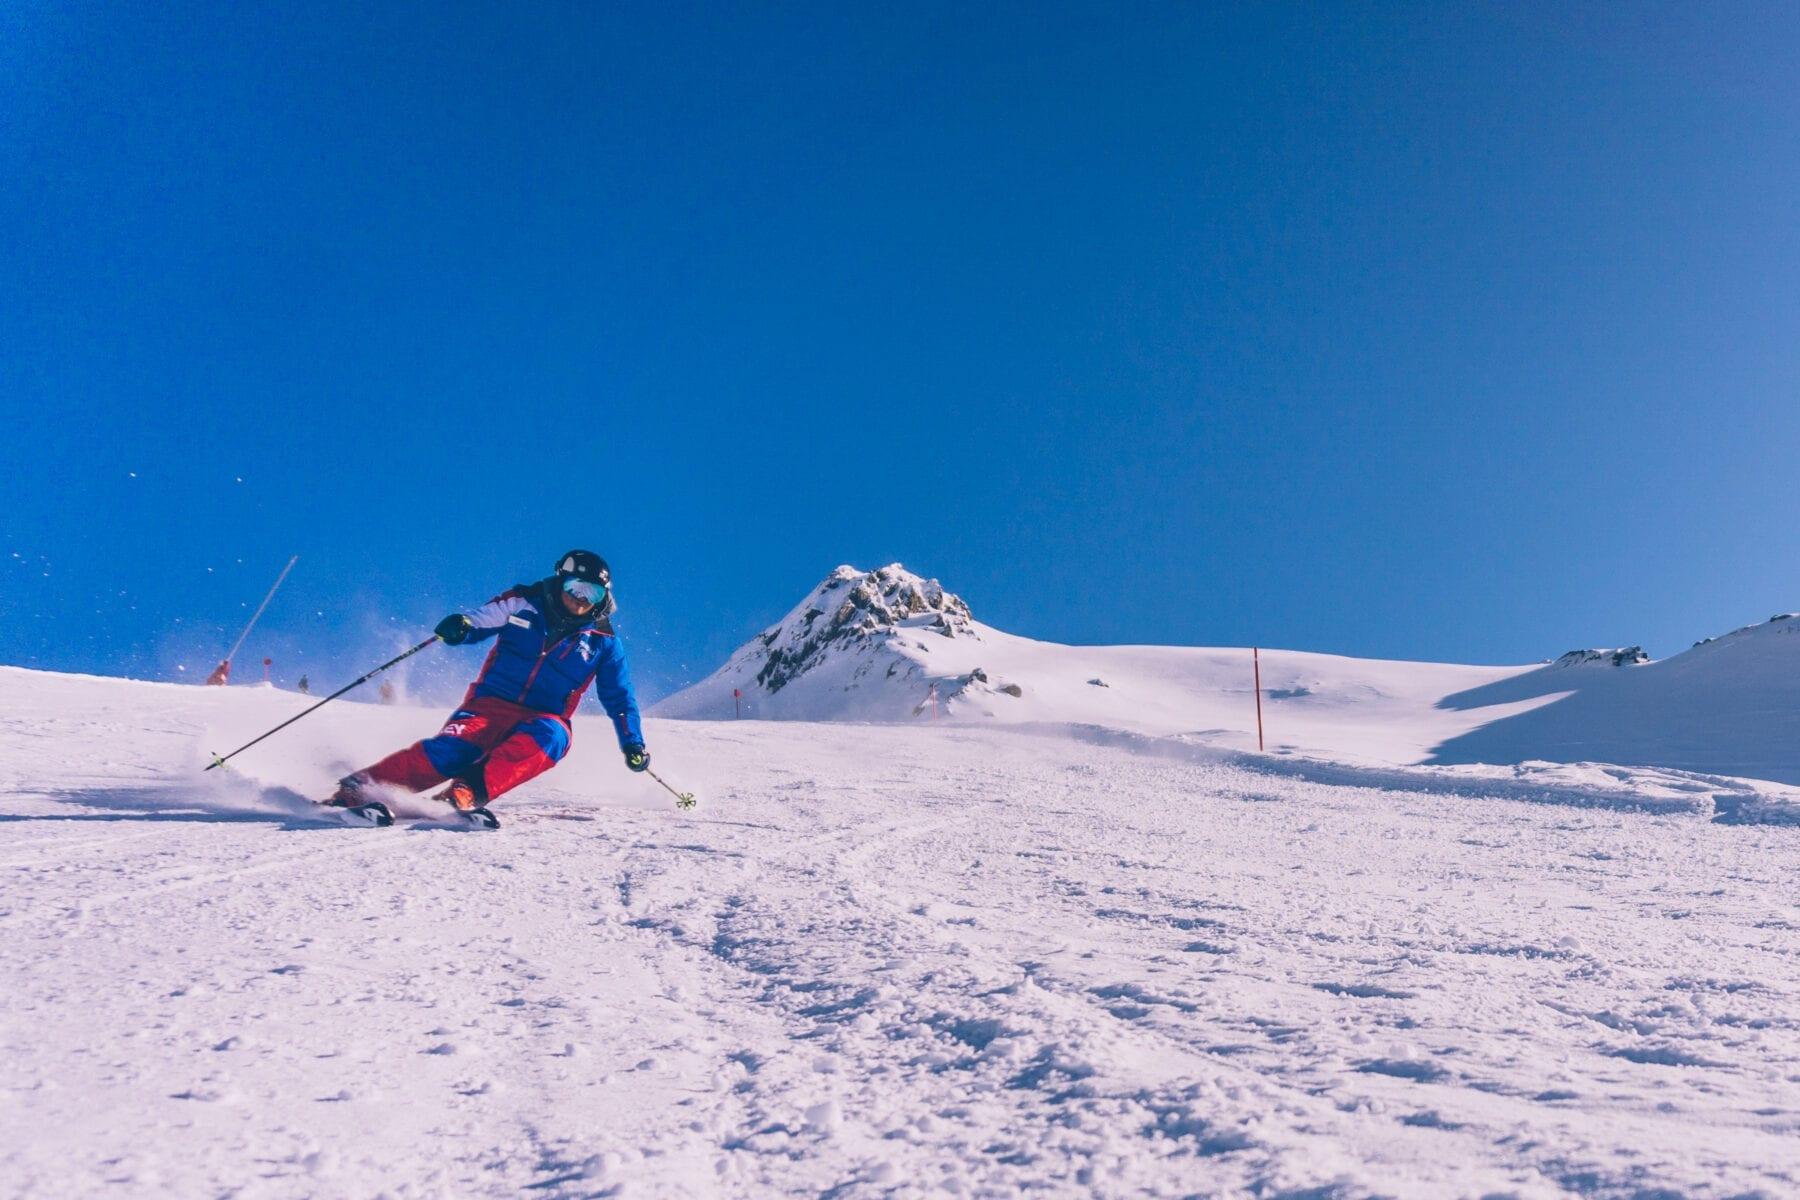 milieubewuste wintersport